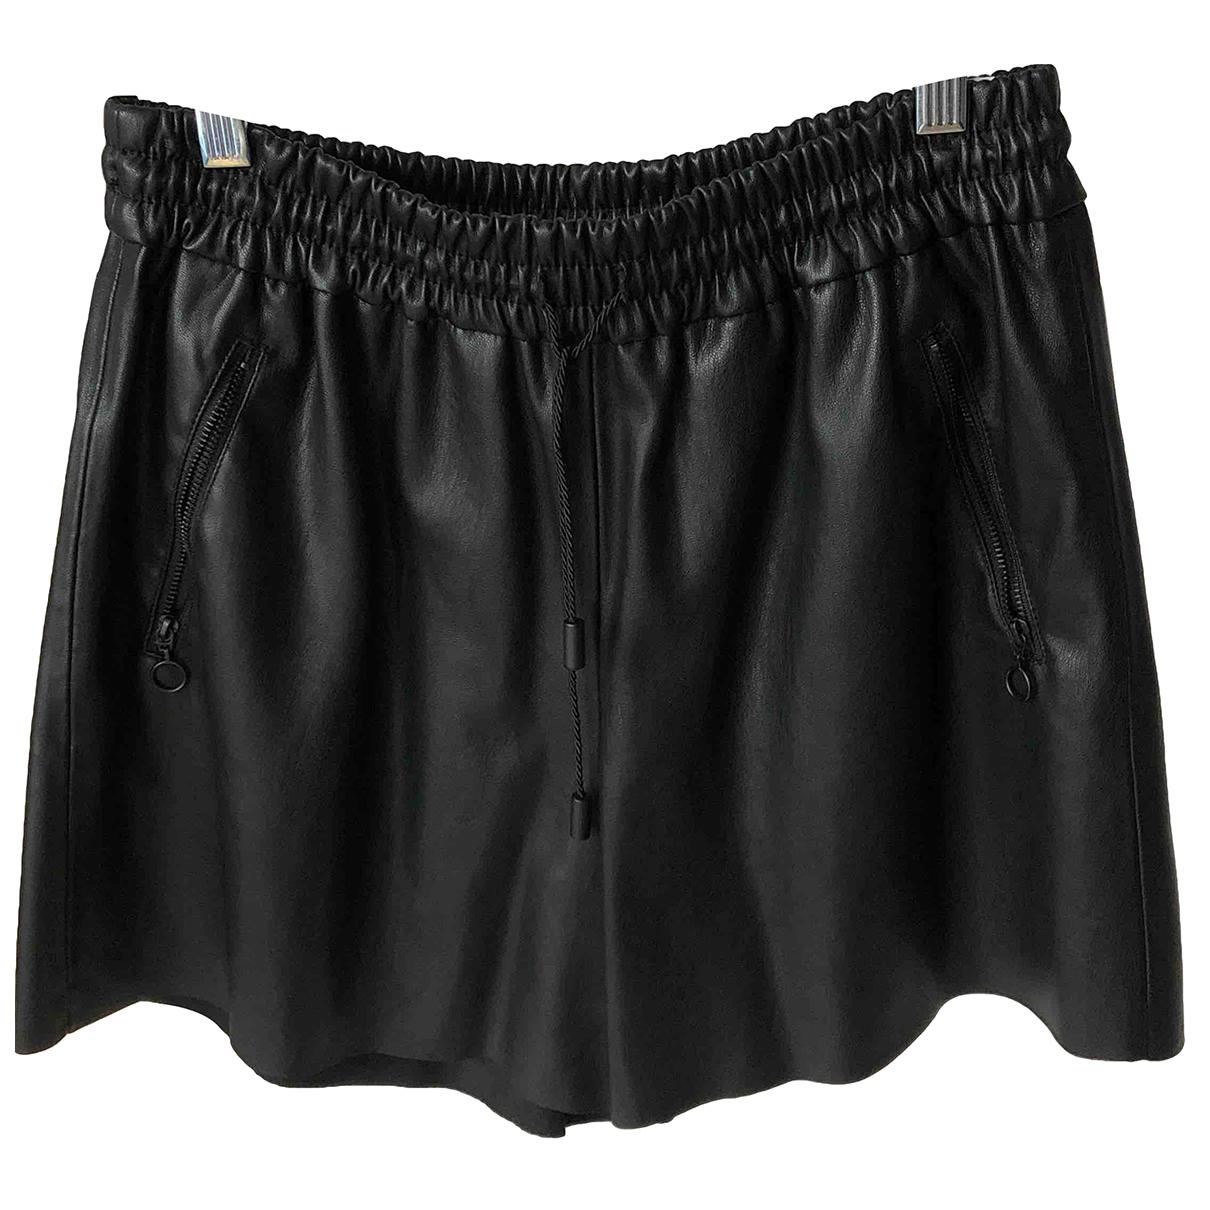 Zara \N Shorts in  Schwarz Polyester